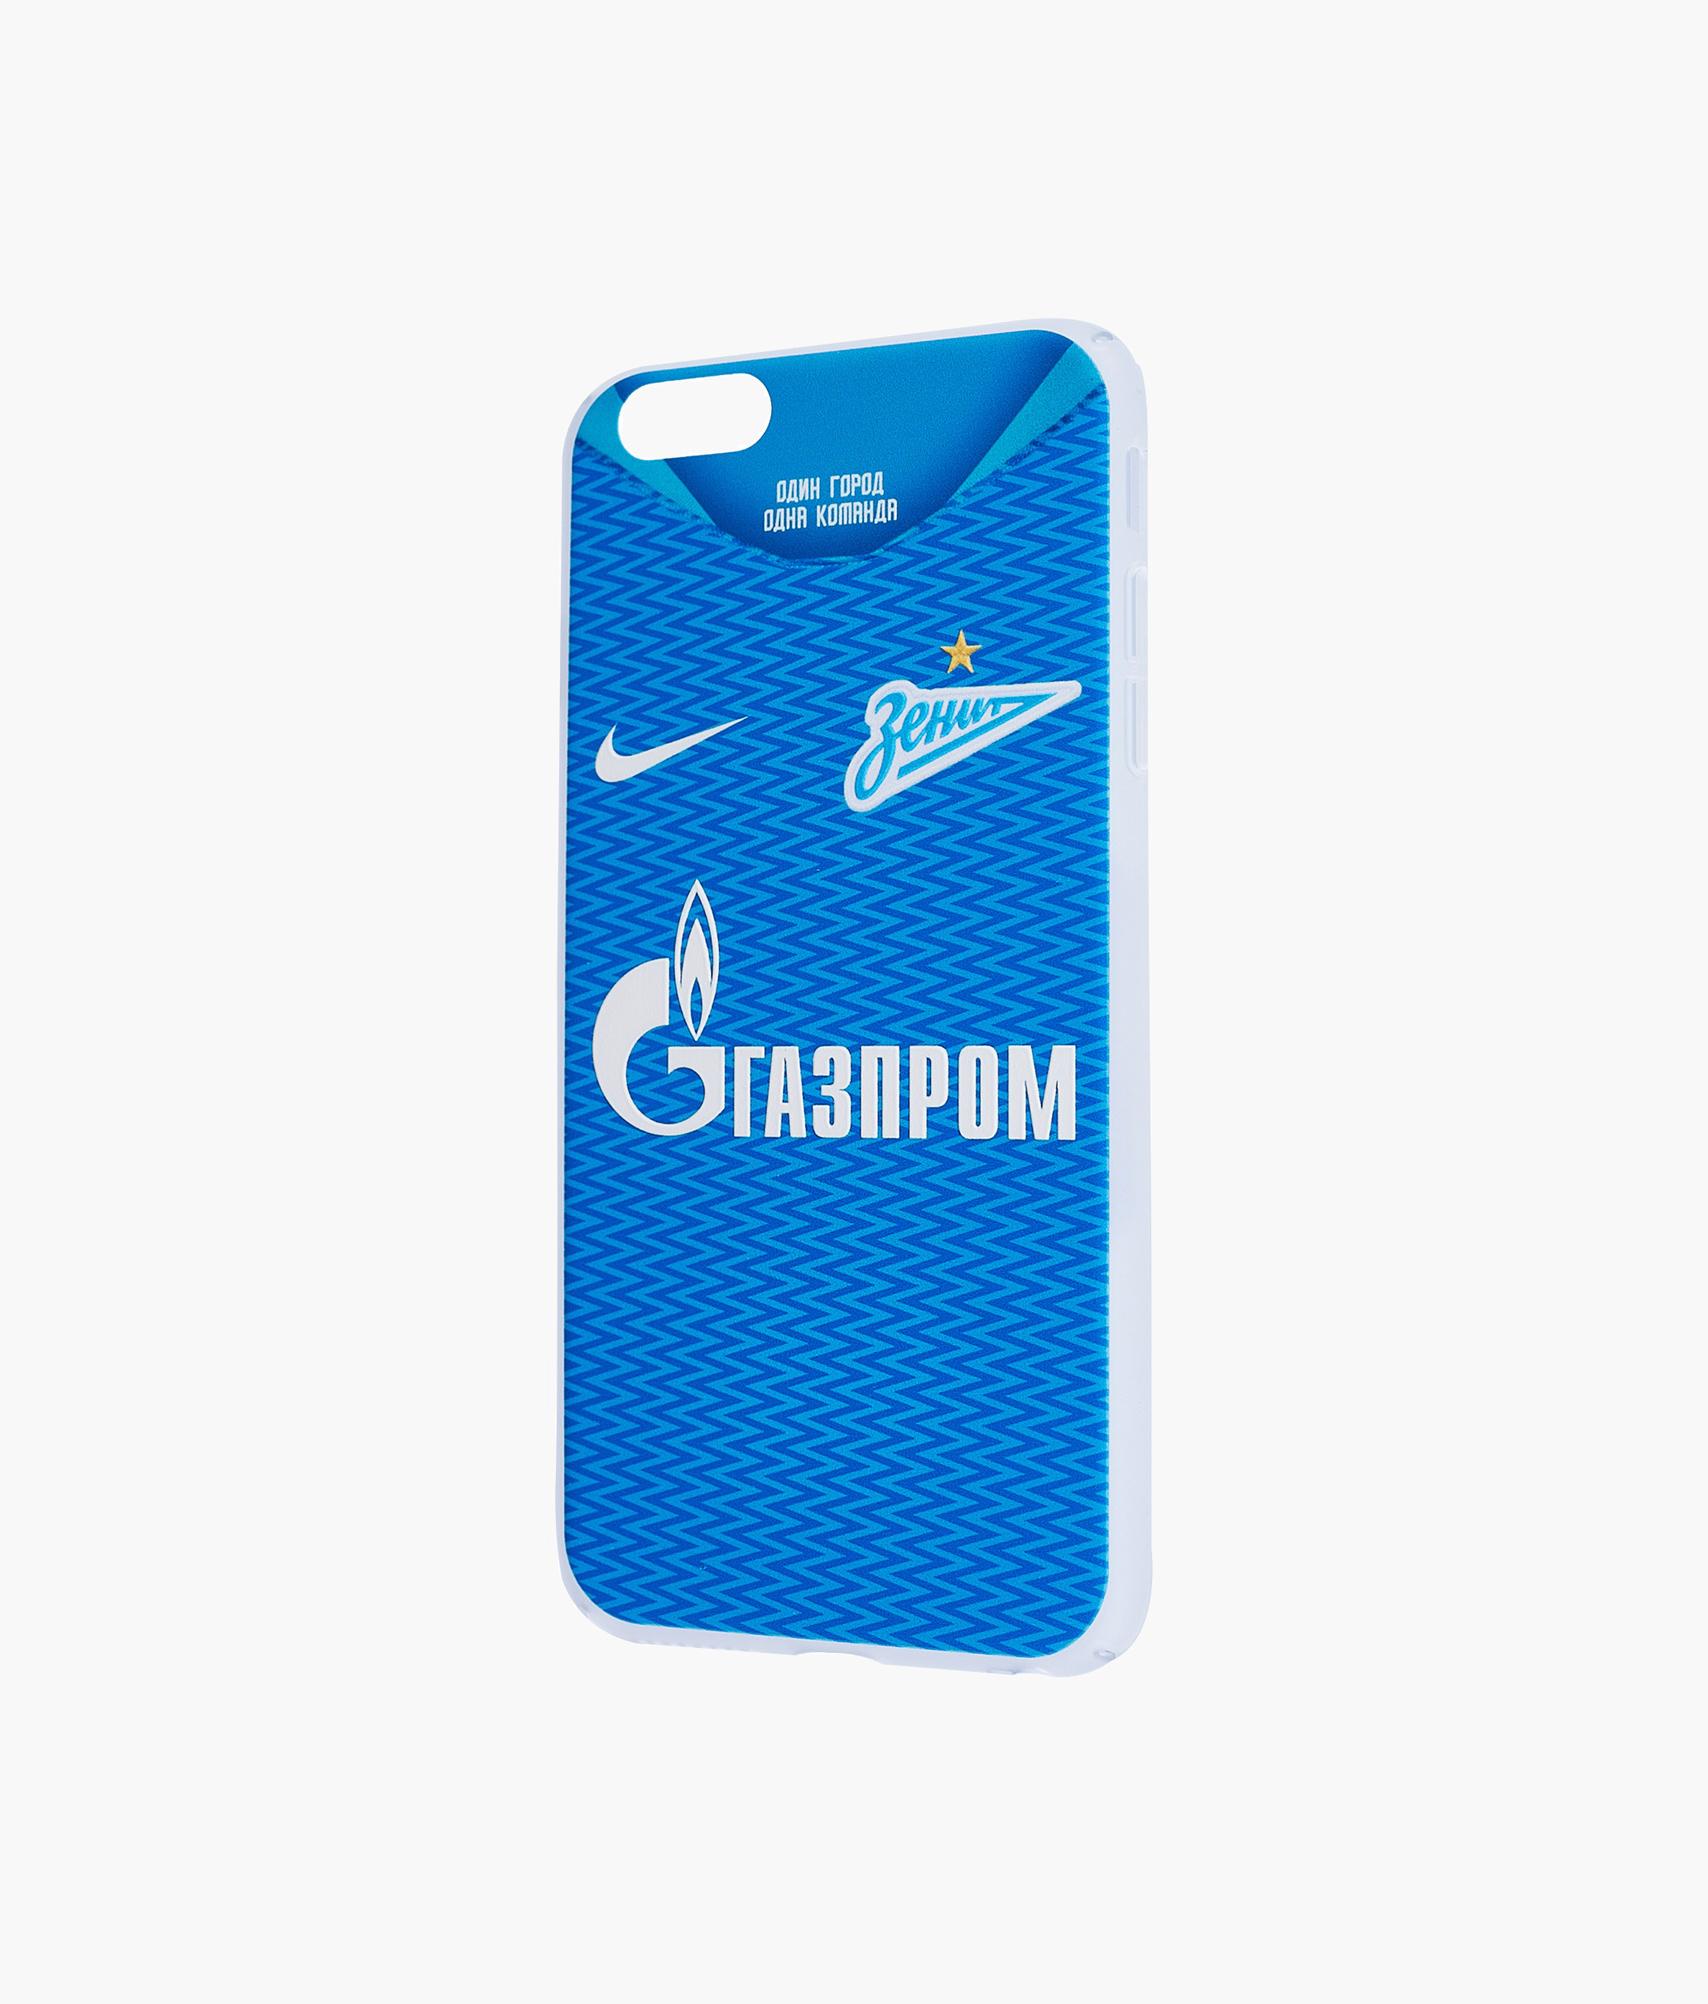 Фото - Чехол для IPhone 6/6S Plus «Форма 2018/19» Зенит чехол накладка для apple iphone 6 6s deppa gel plus case 85213 pink клип кейс полиуретан